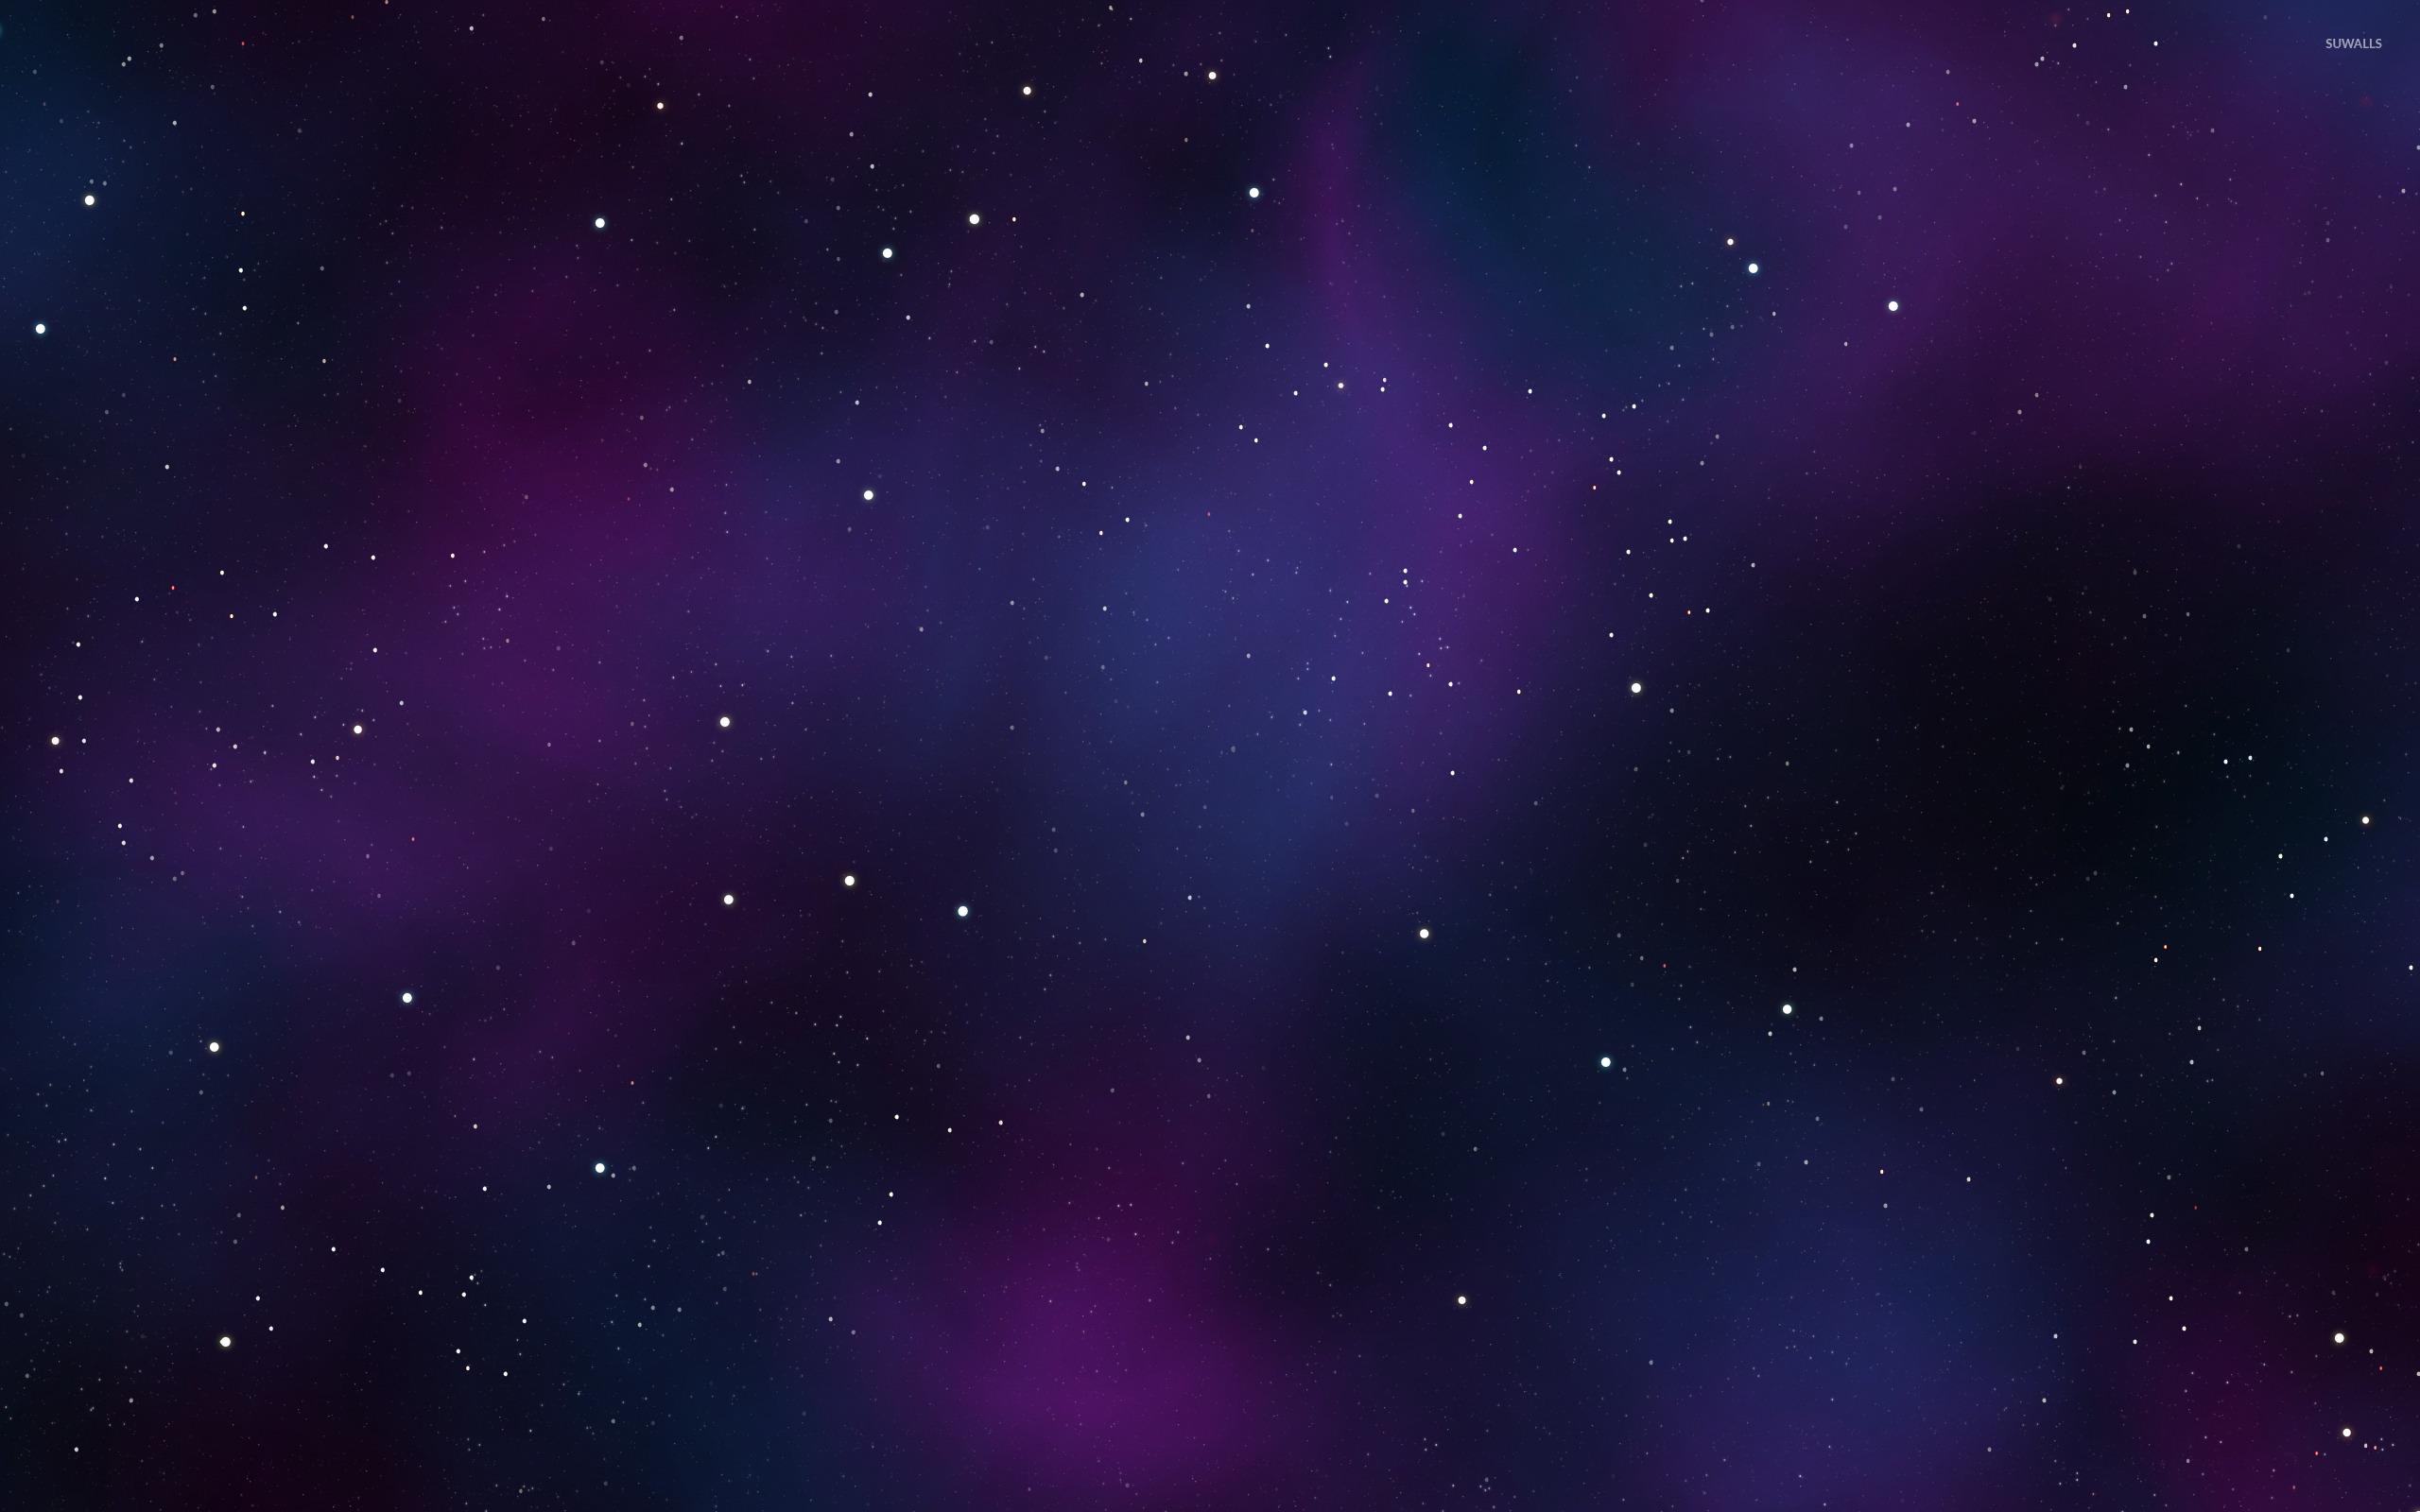 Purple nebula [3] wallpaper - Space wallpapers - #43219